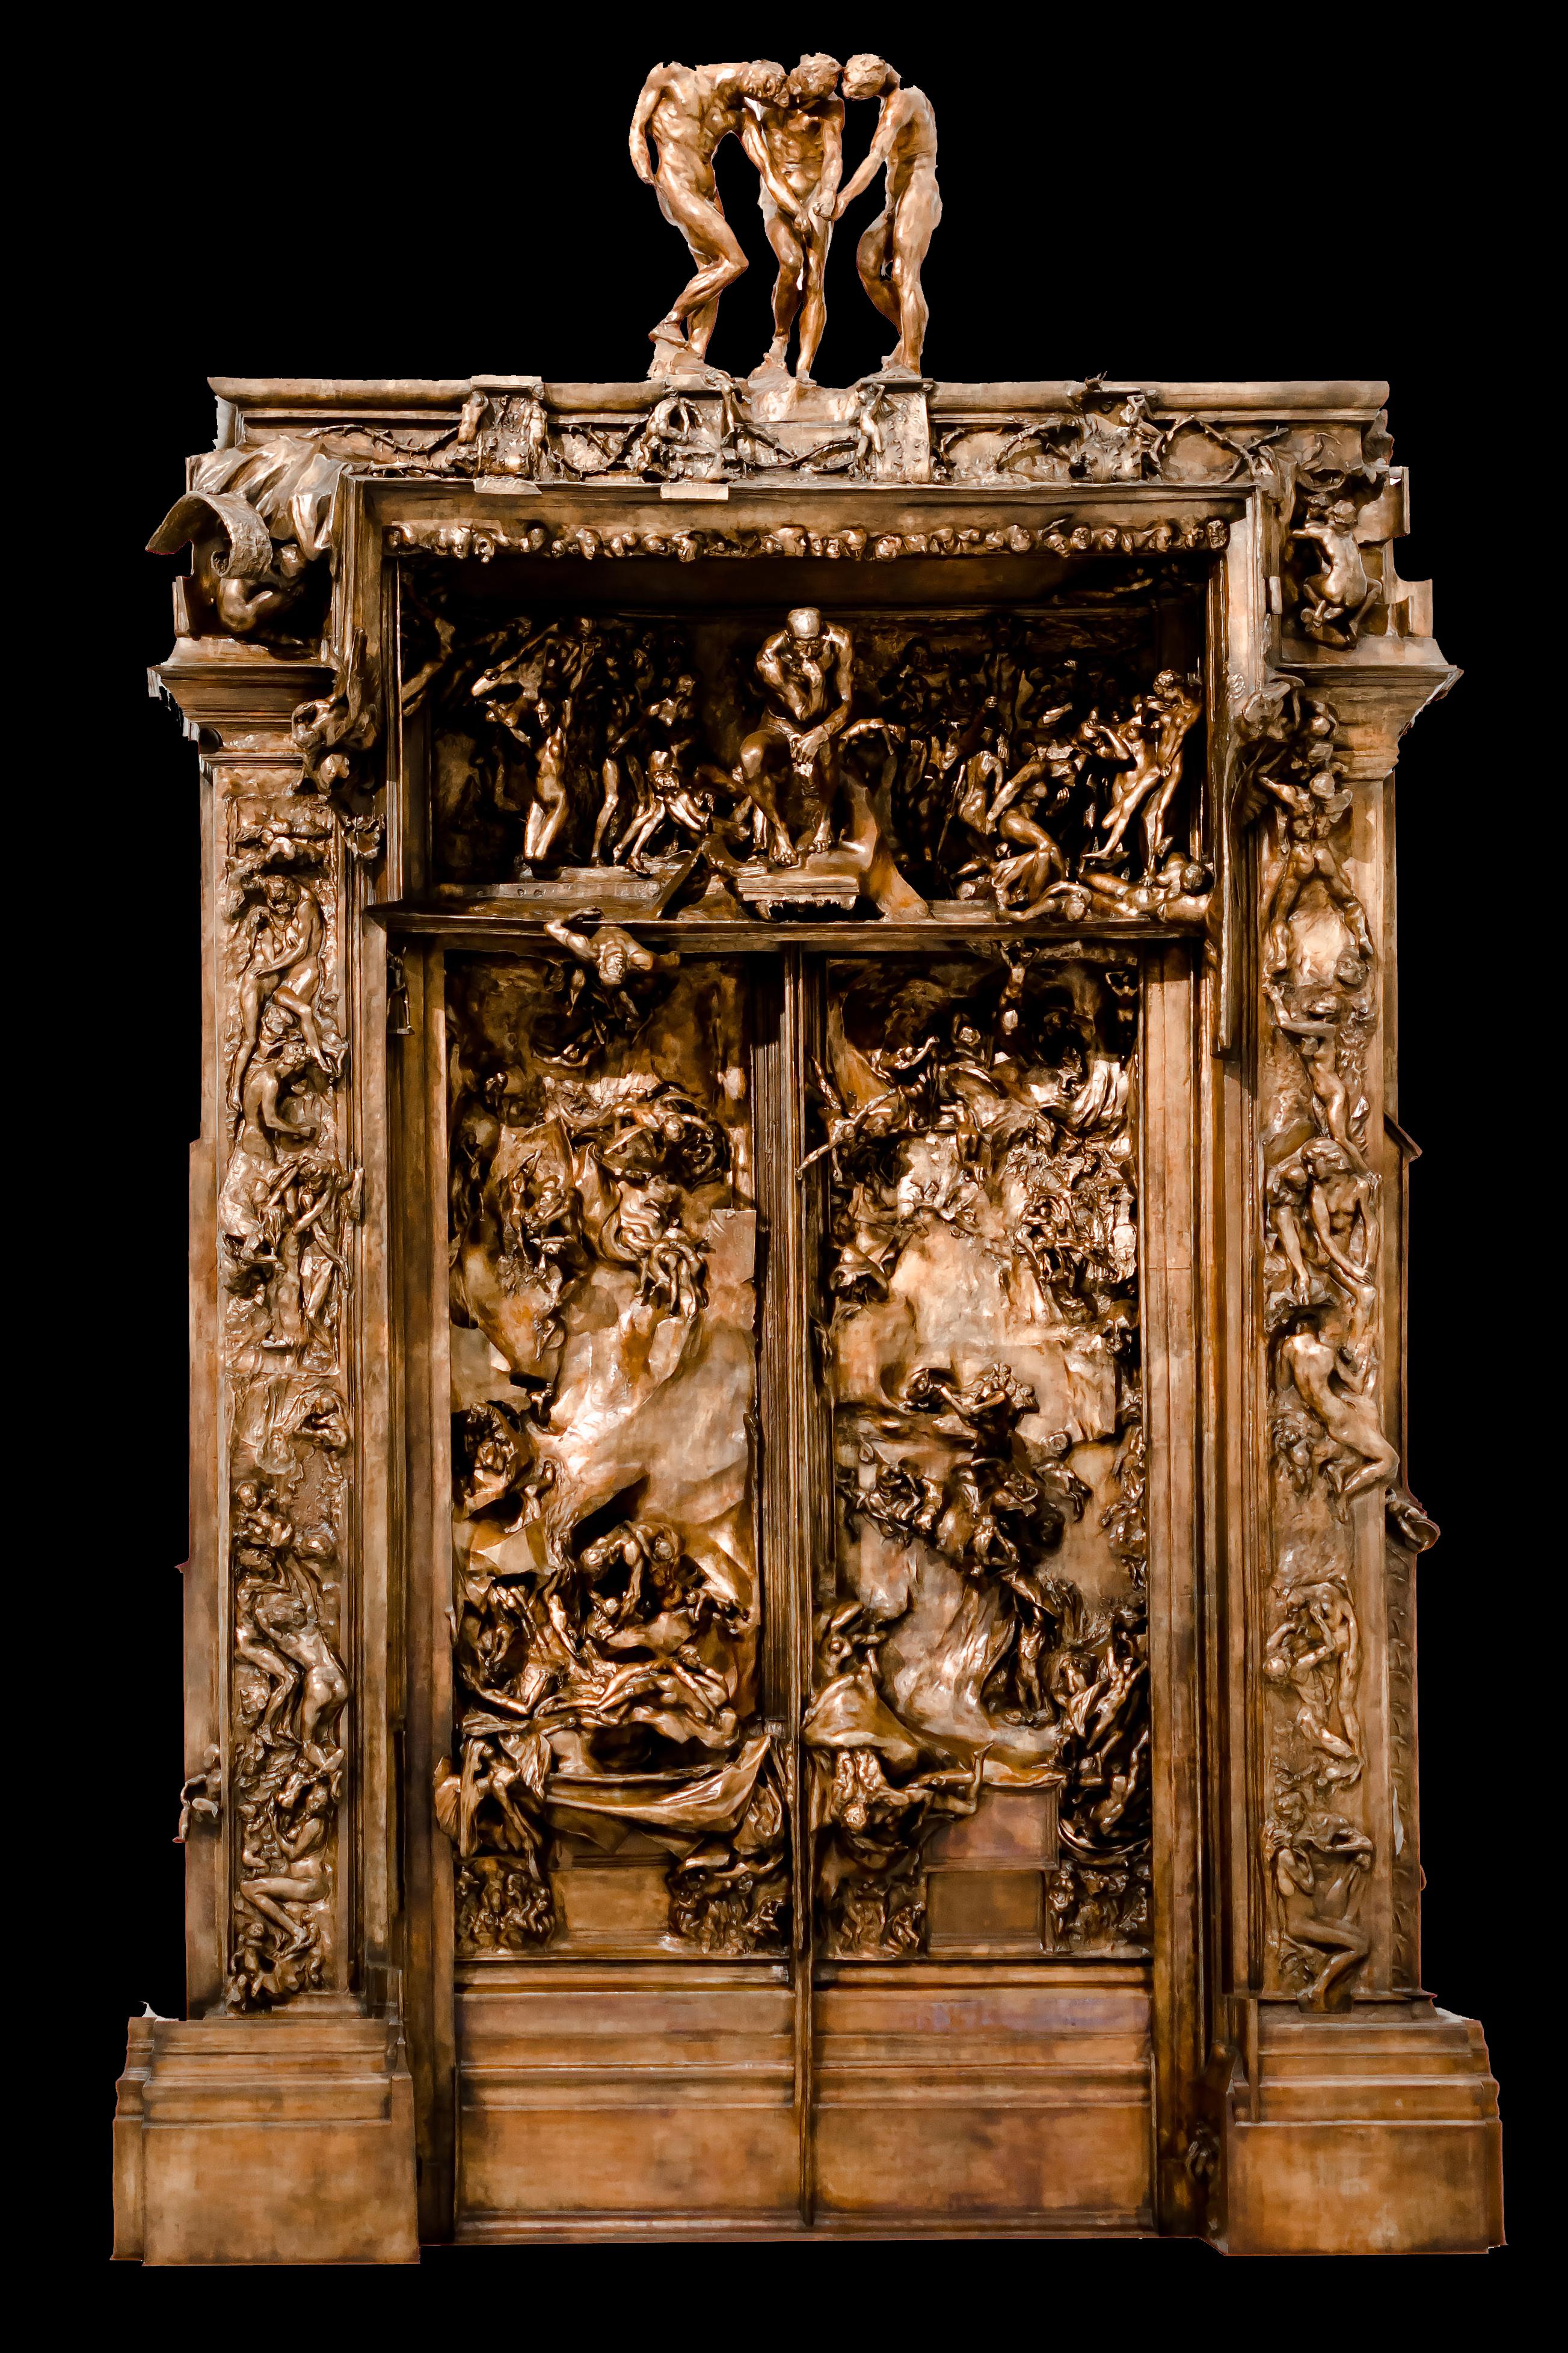 La_puerta_del_Infierno_de_Rodin_del_muse